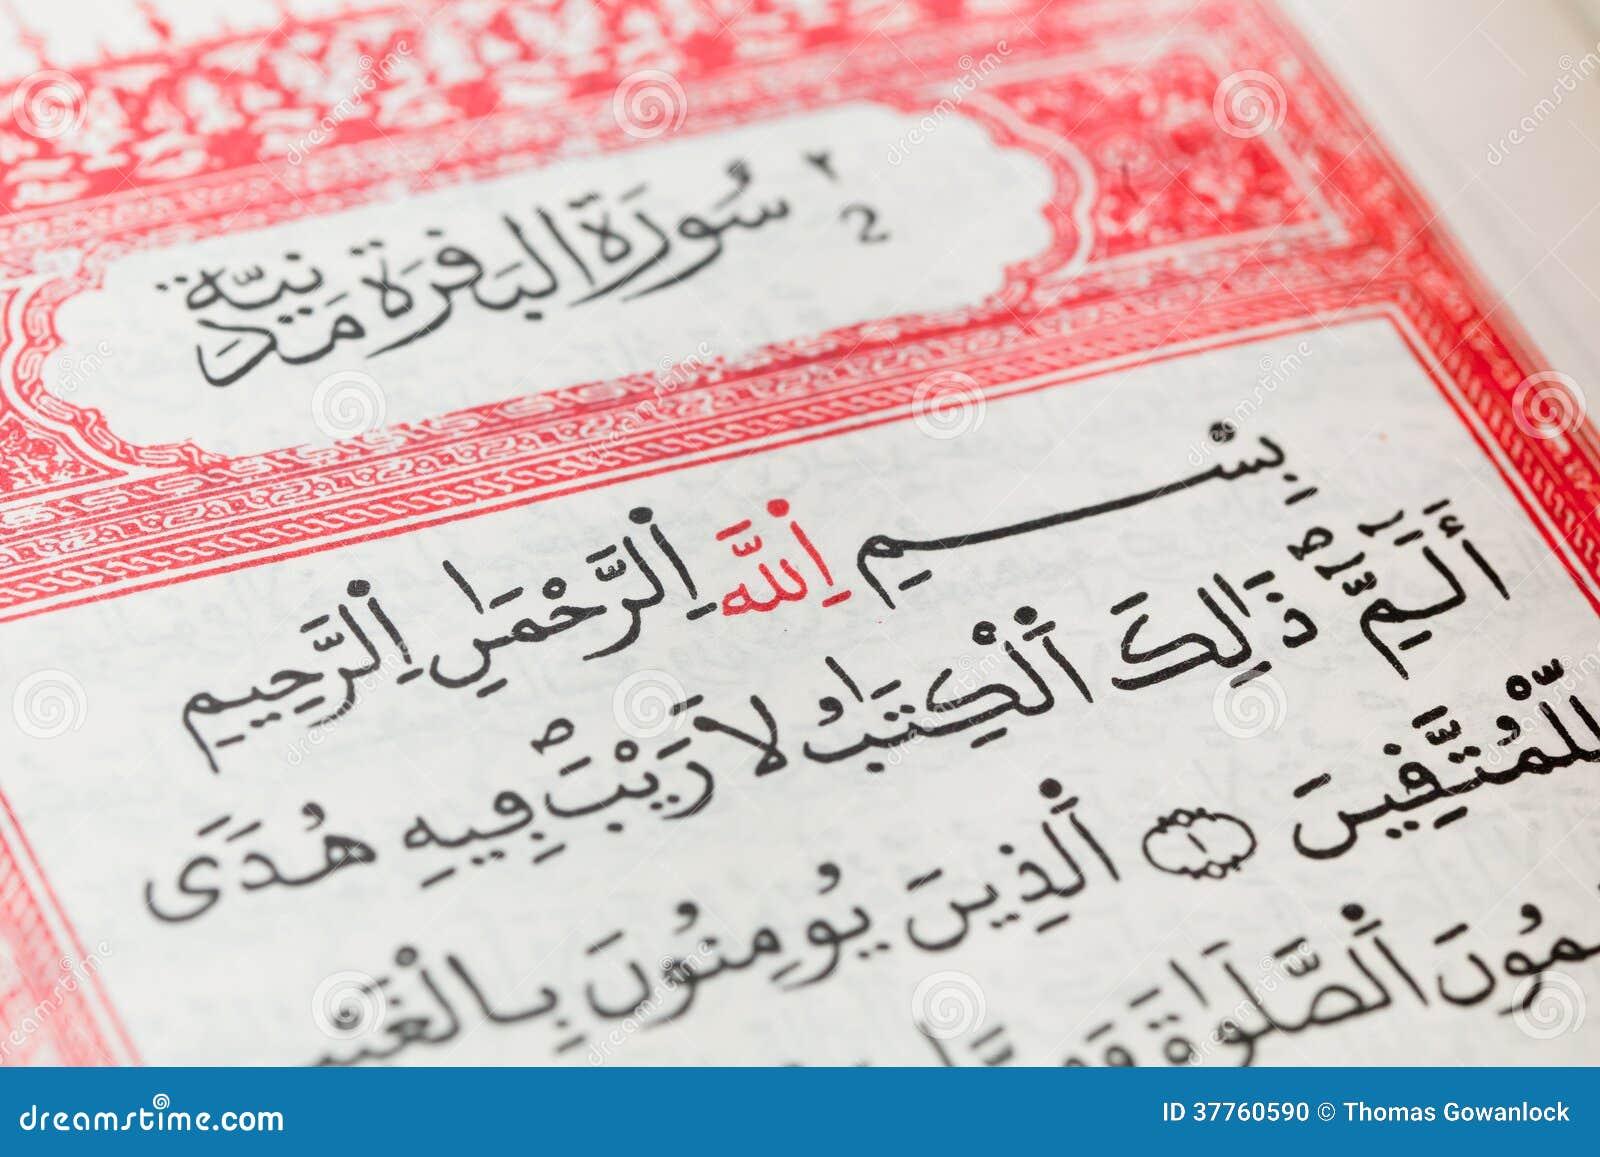 Quran text stock photo  Image of arabic, holy, quran - 37760590